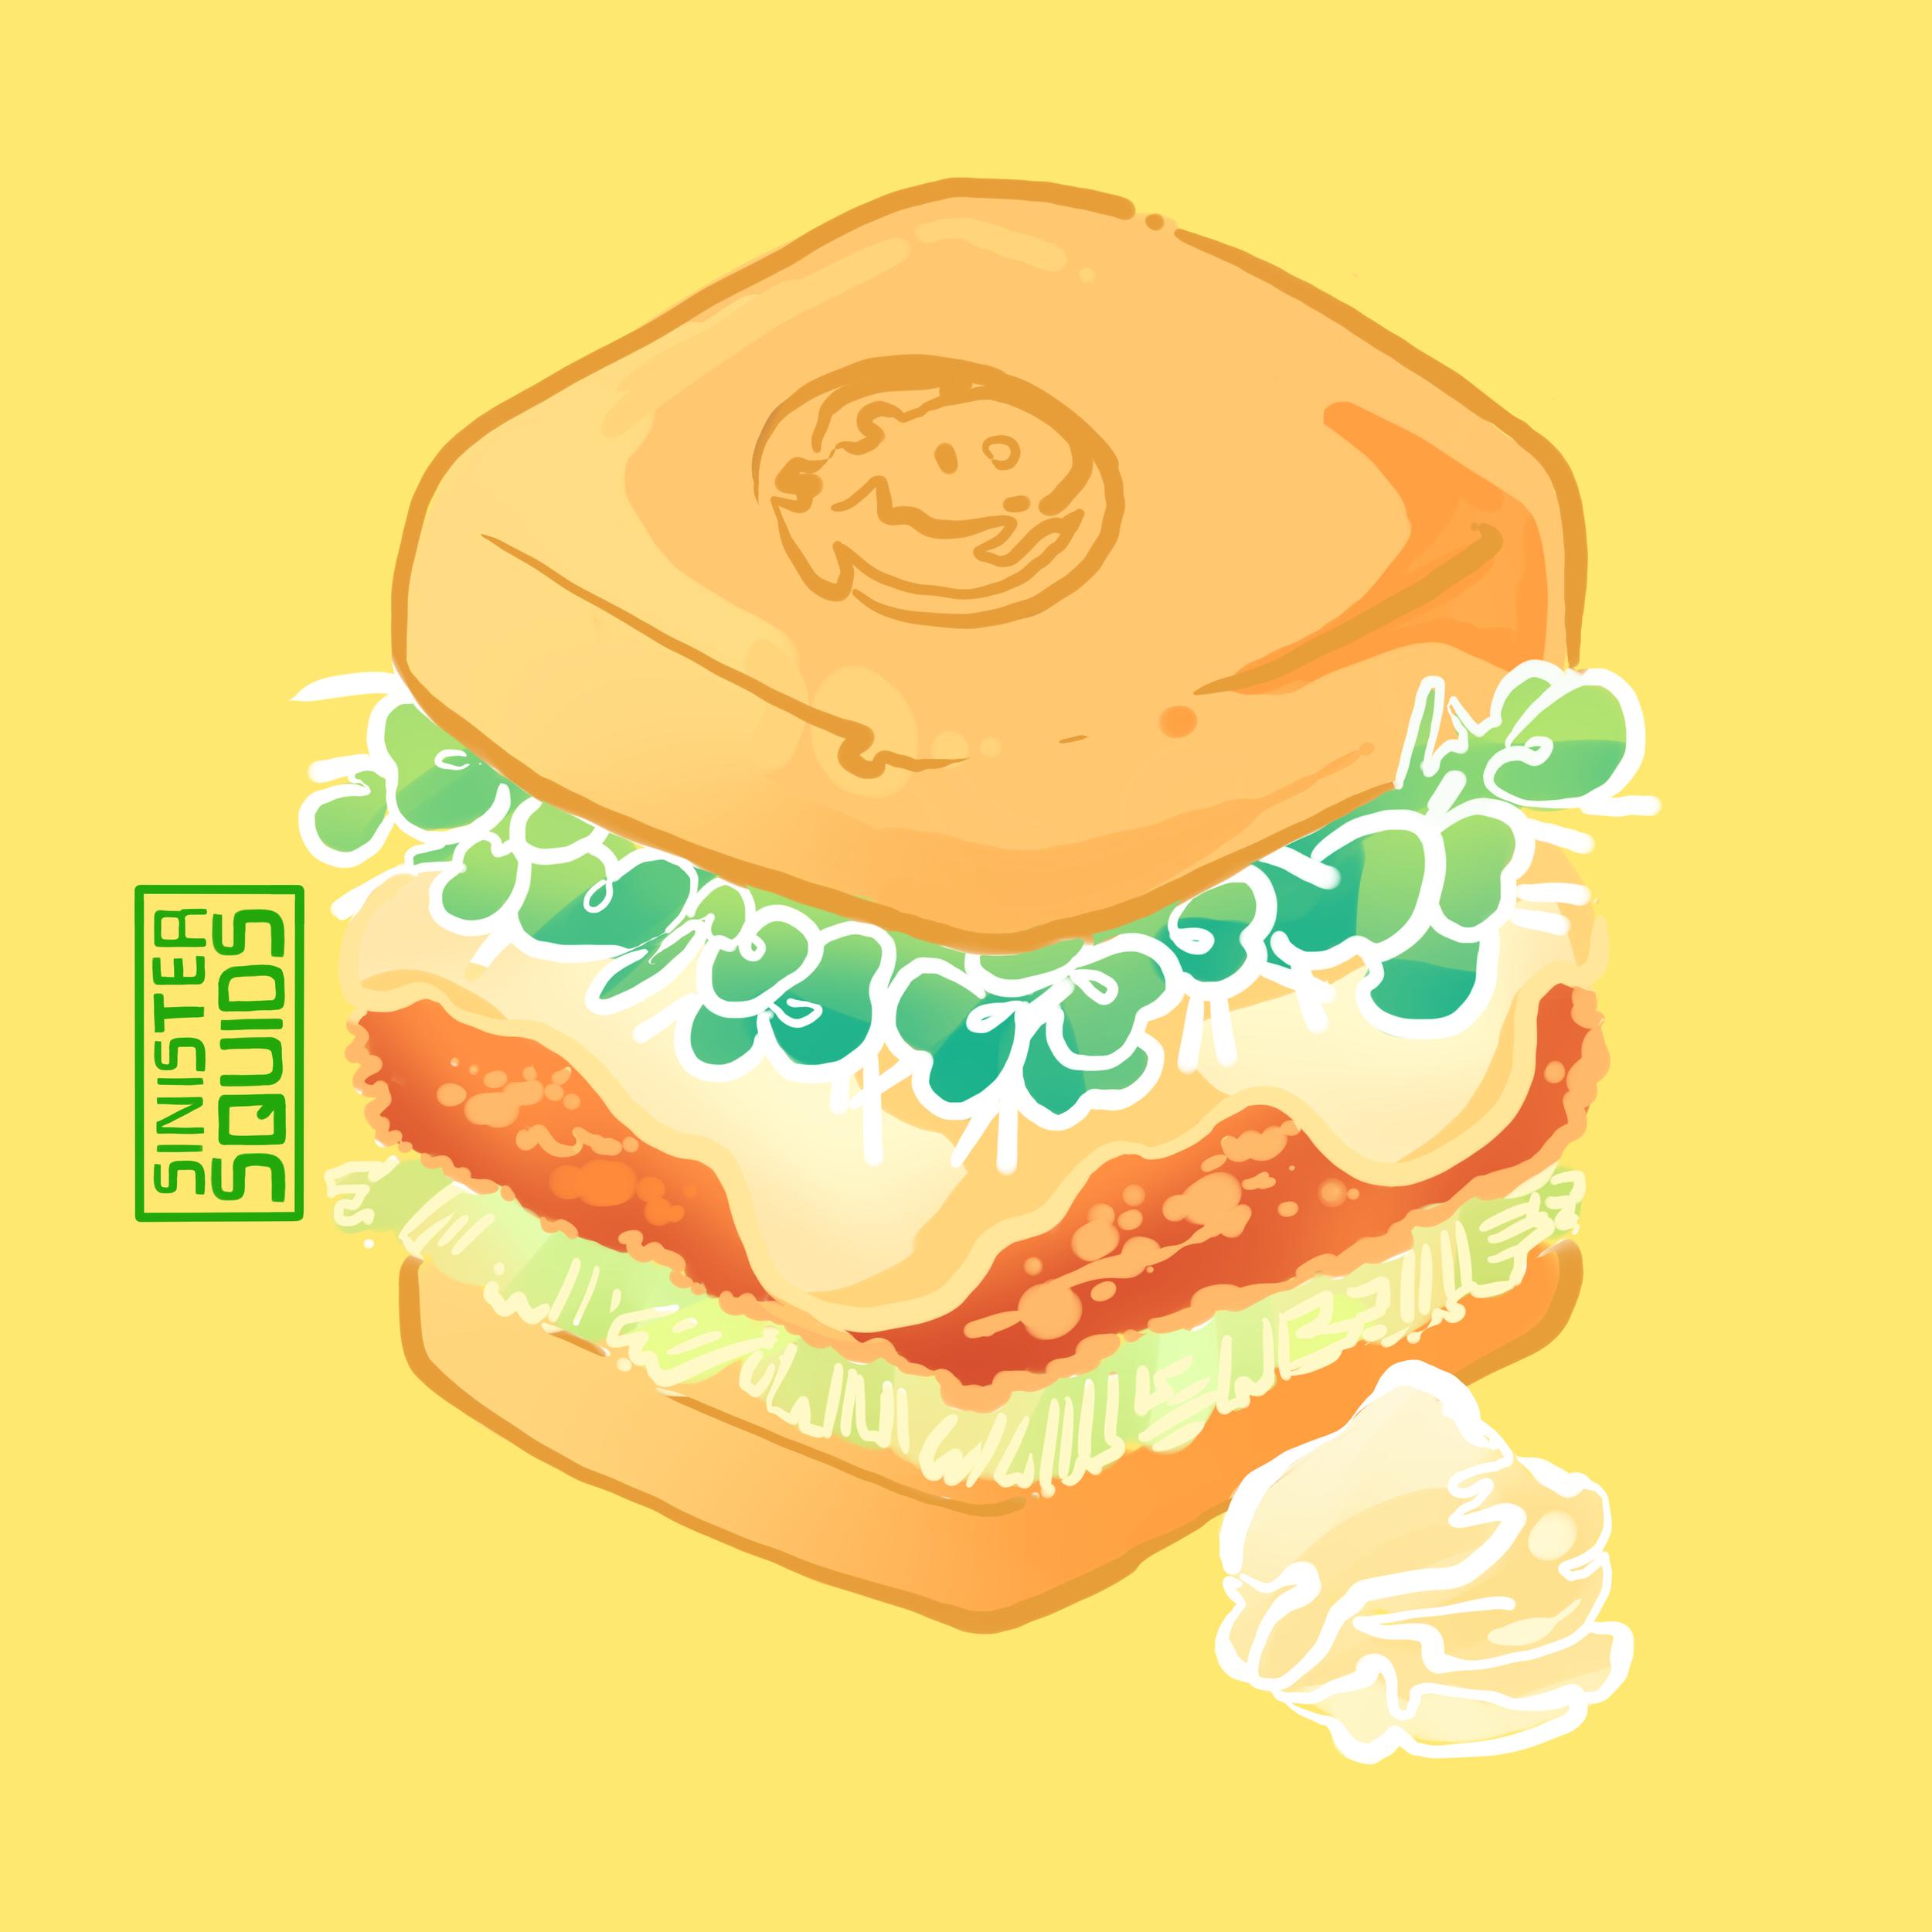 kobu-jime fish burger2.png